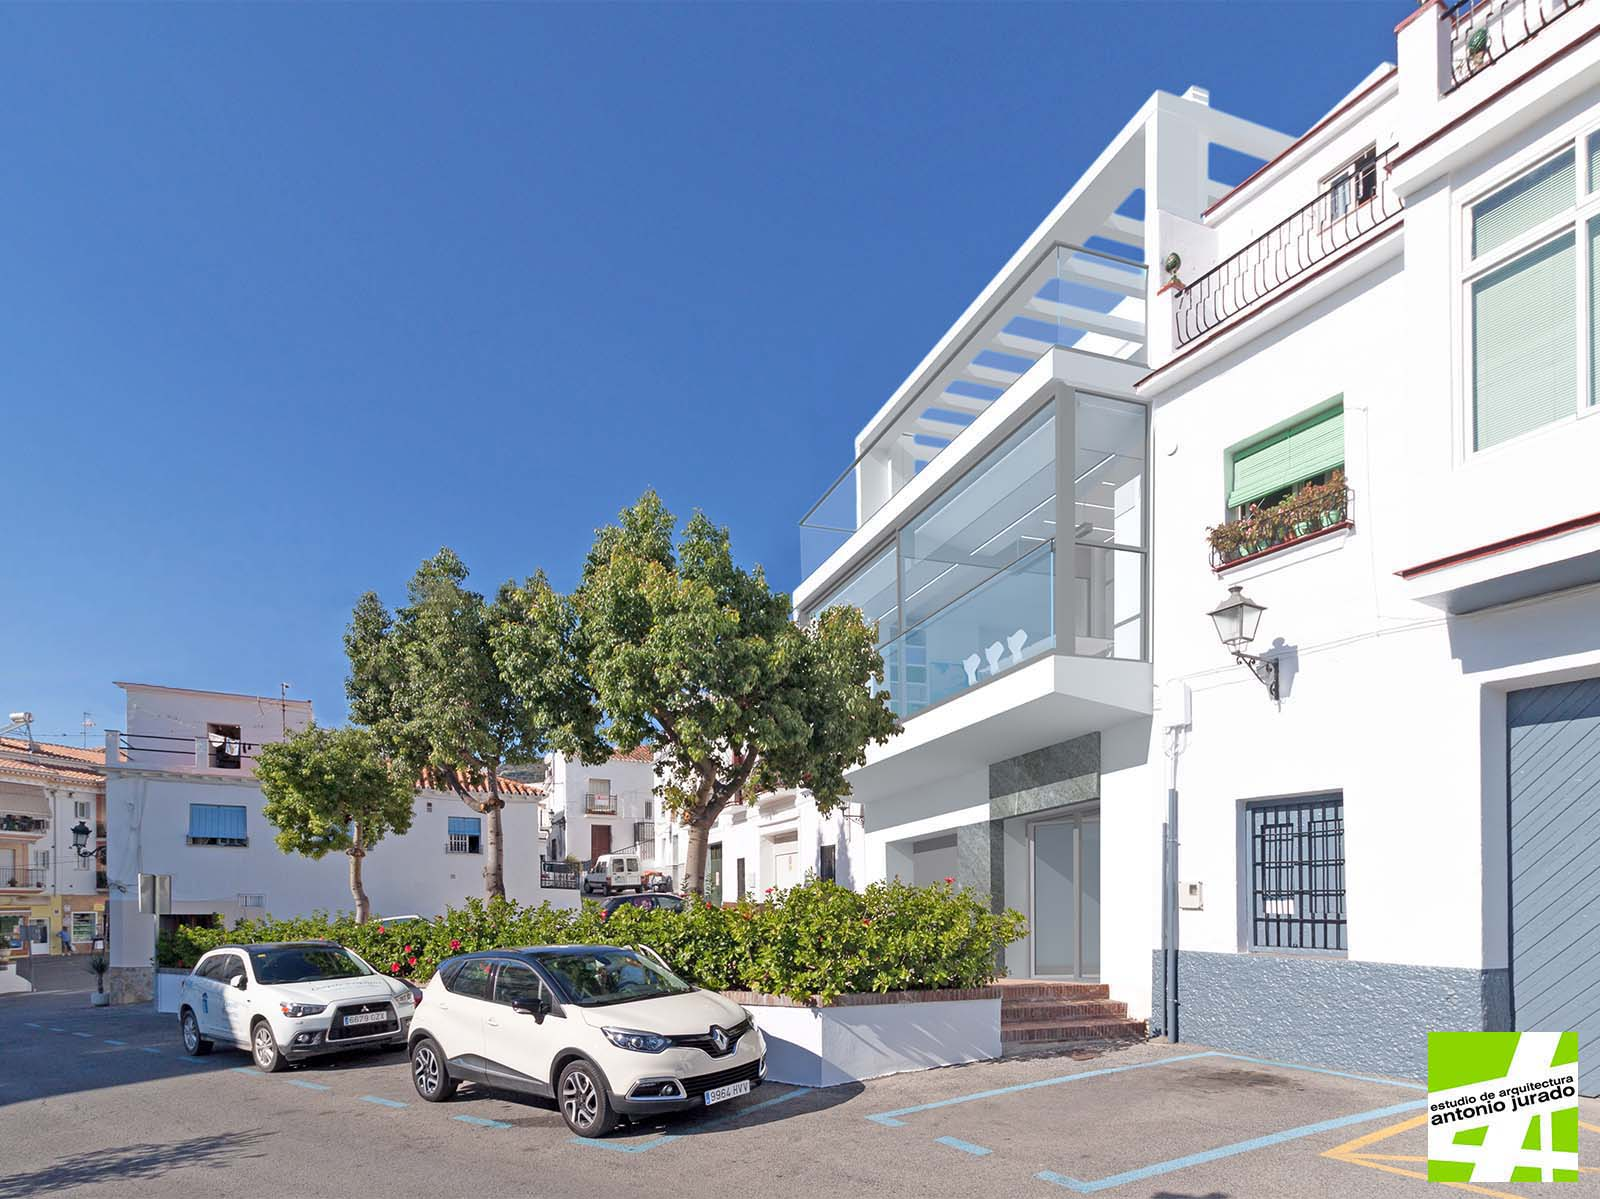 casa-ra-house-torrox-malaga-antonio-jurado-arquitecto-01